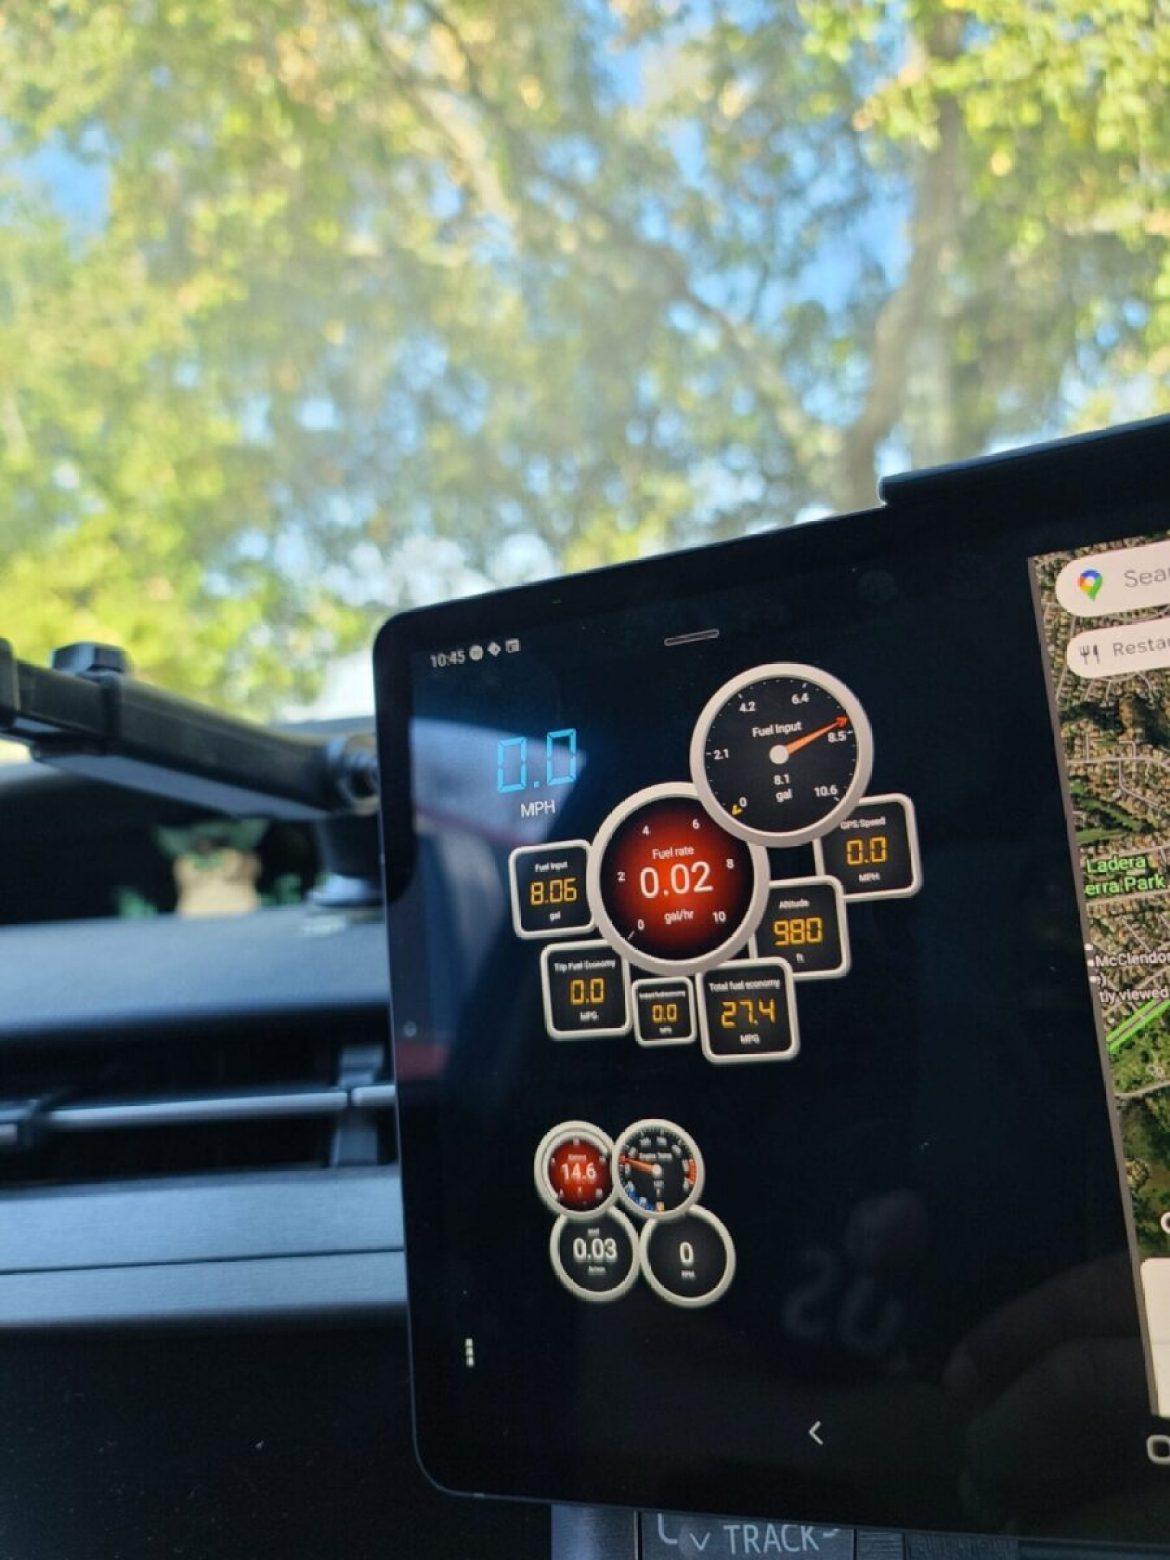 OBDLink app on a Toyota Prius